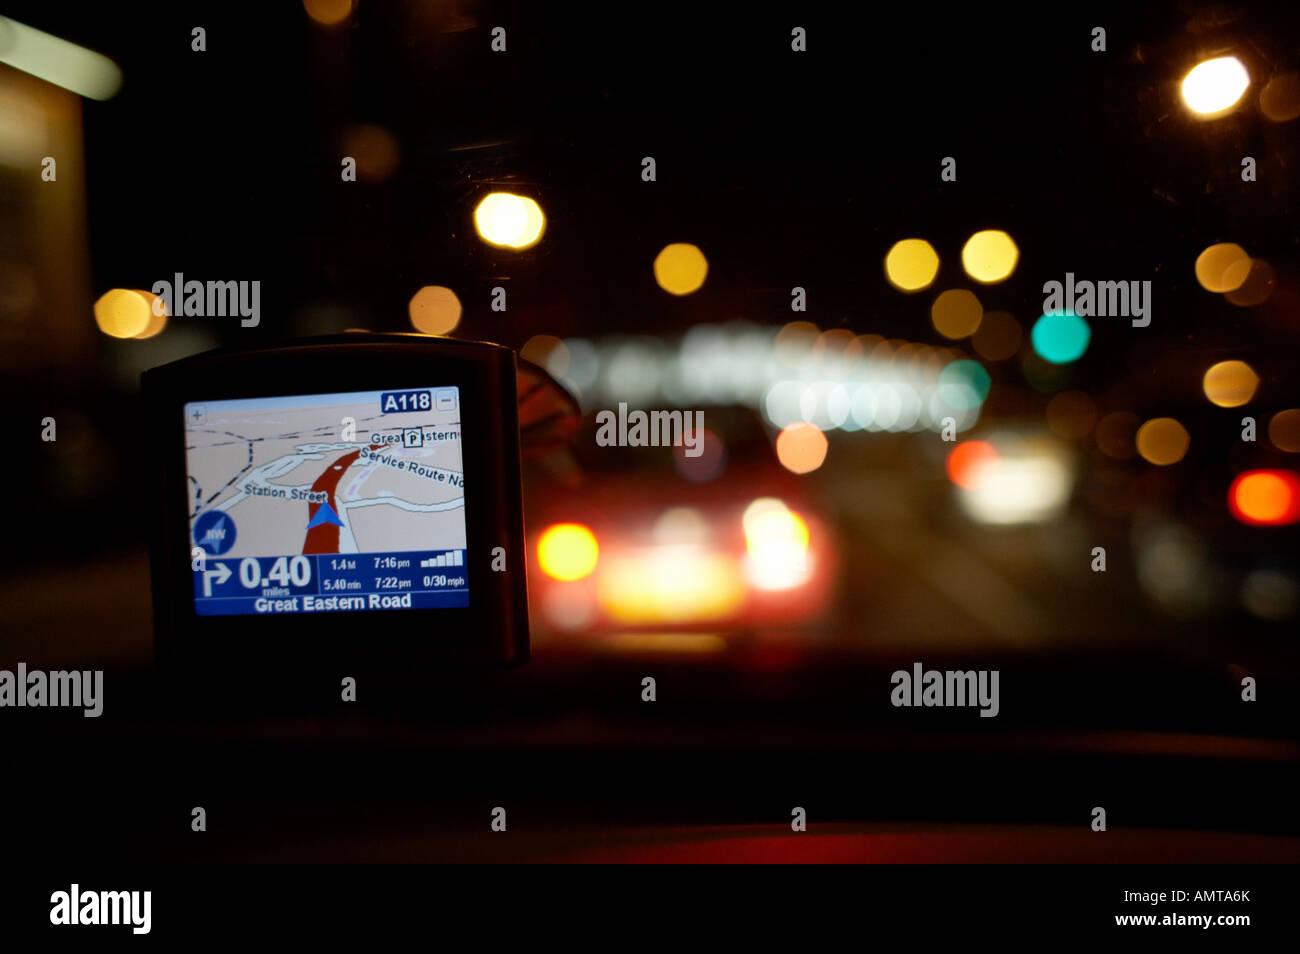 Tomtom One GPS satnav sattelite navigation system - Stock Image